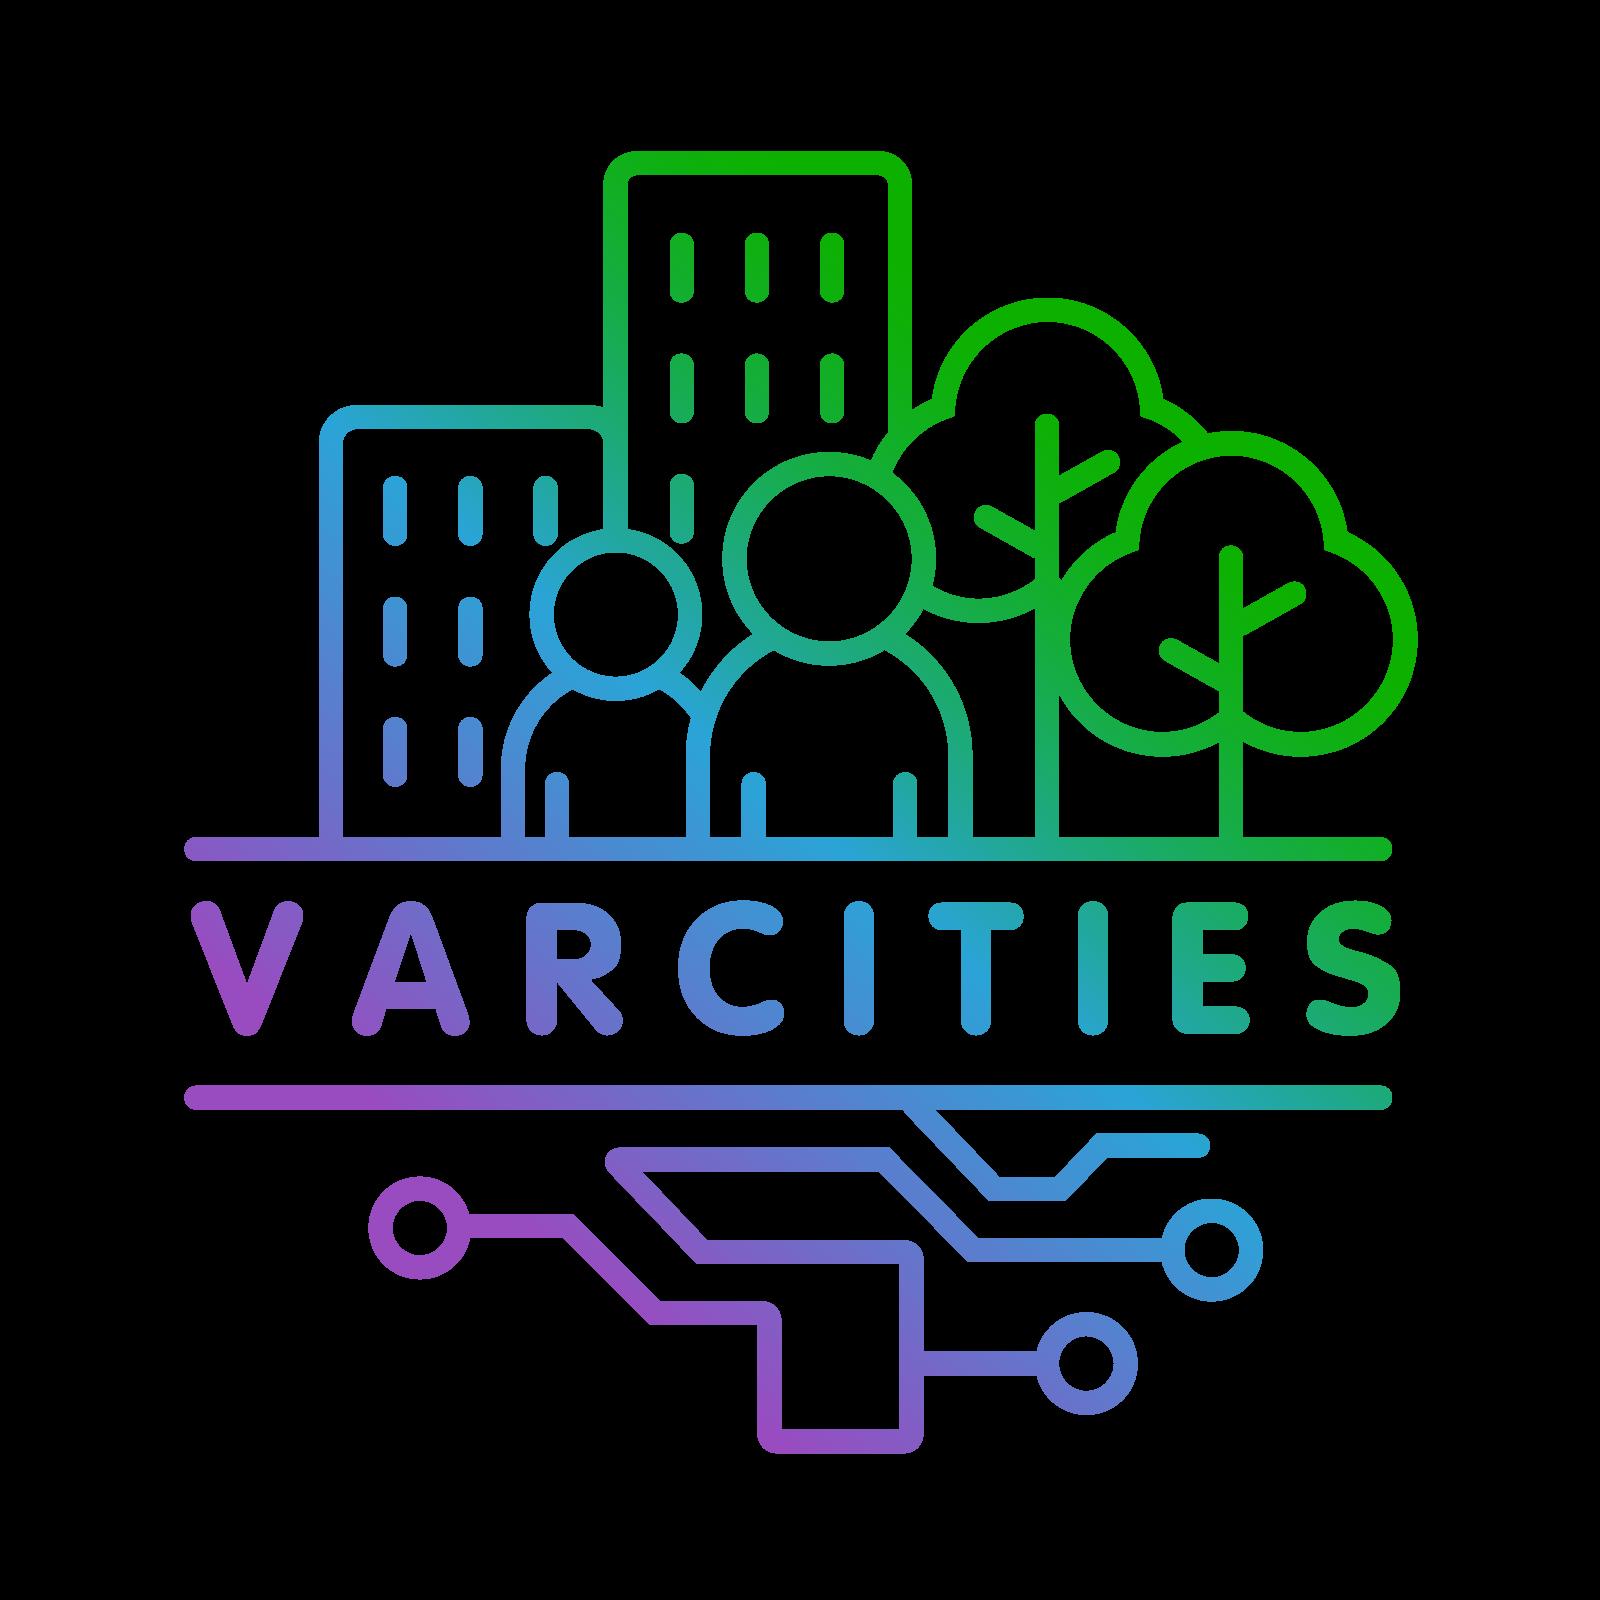 Varcities-logo-RGB1 - Daniela Quacinella.png